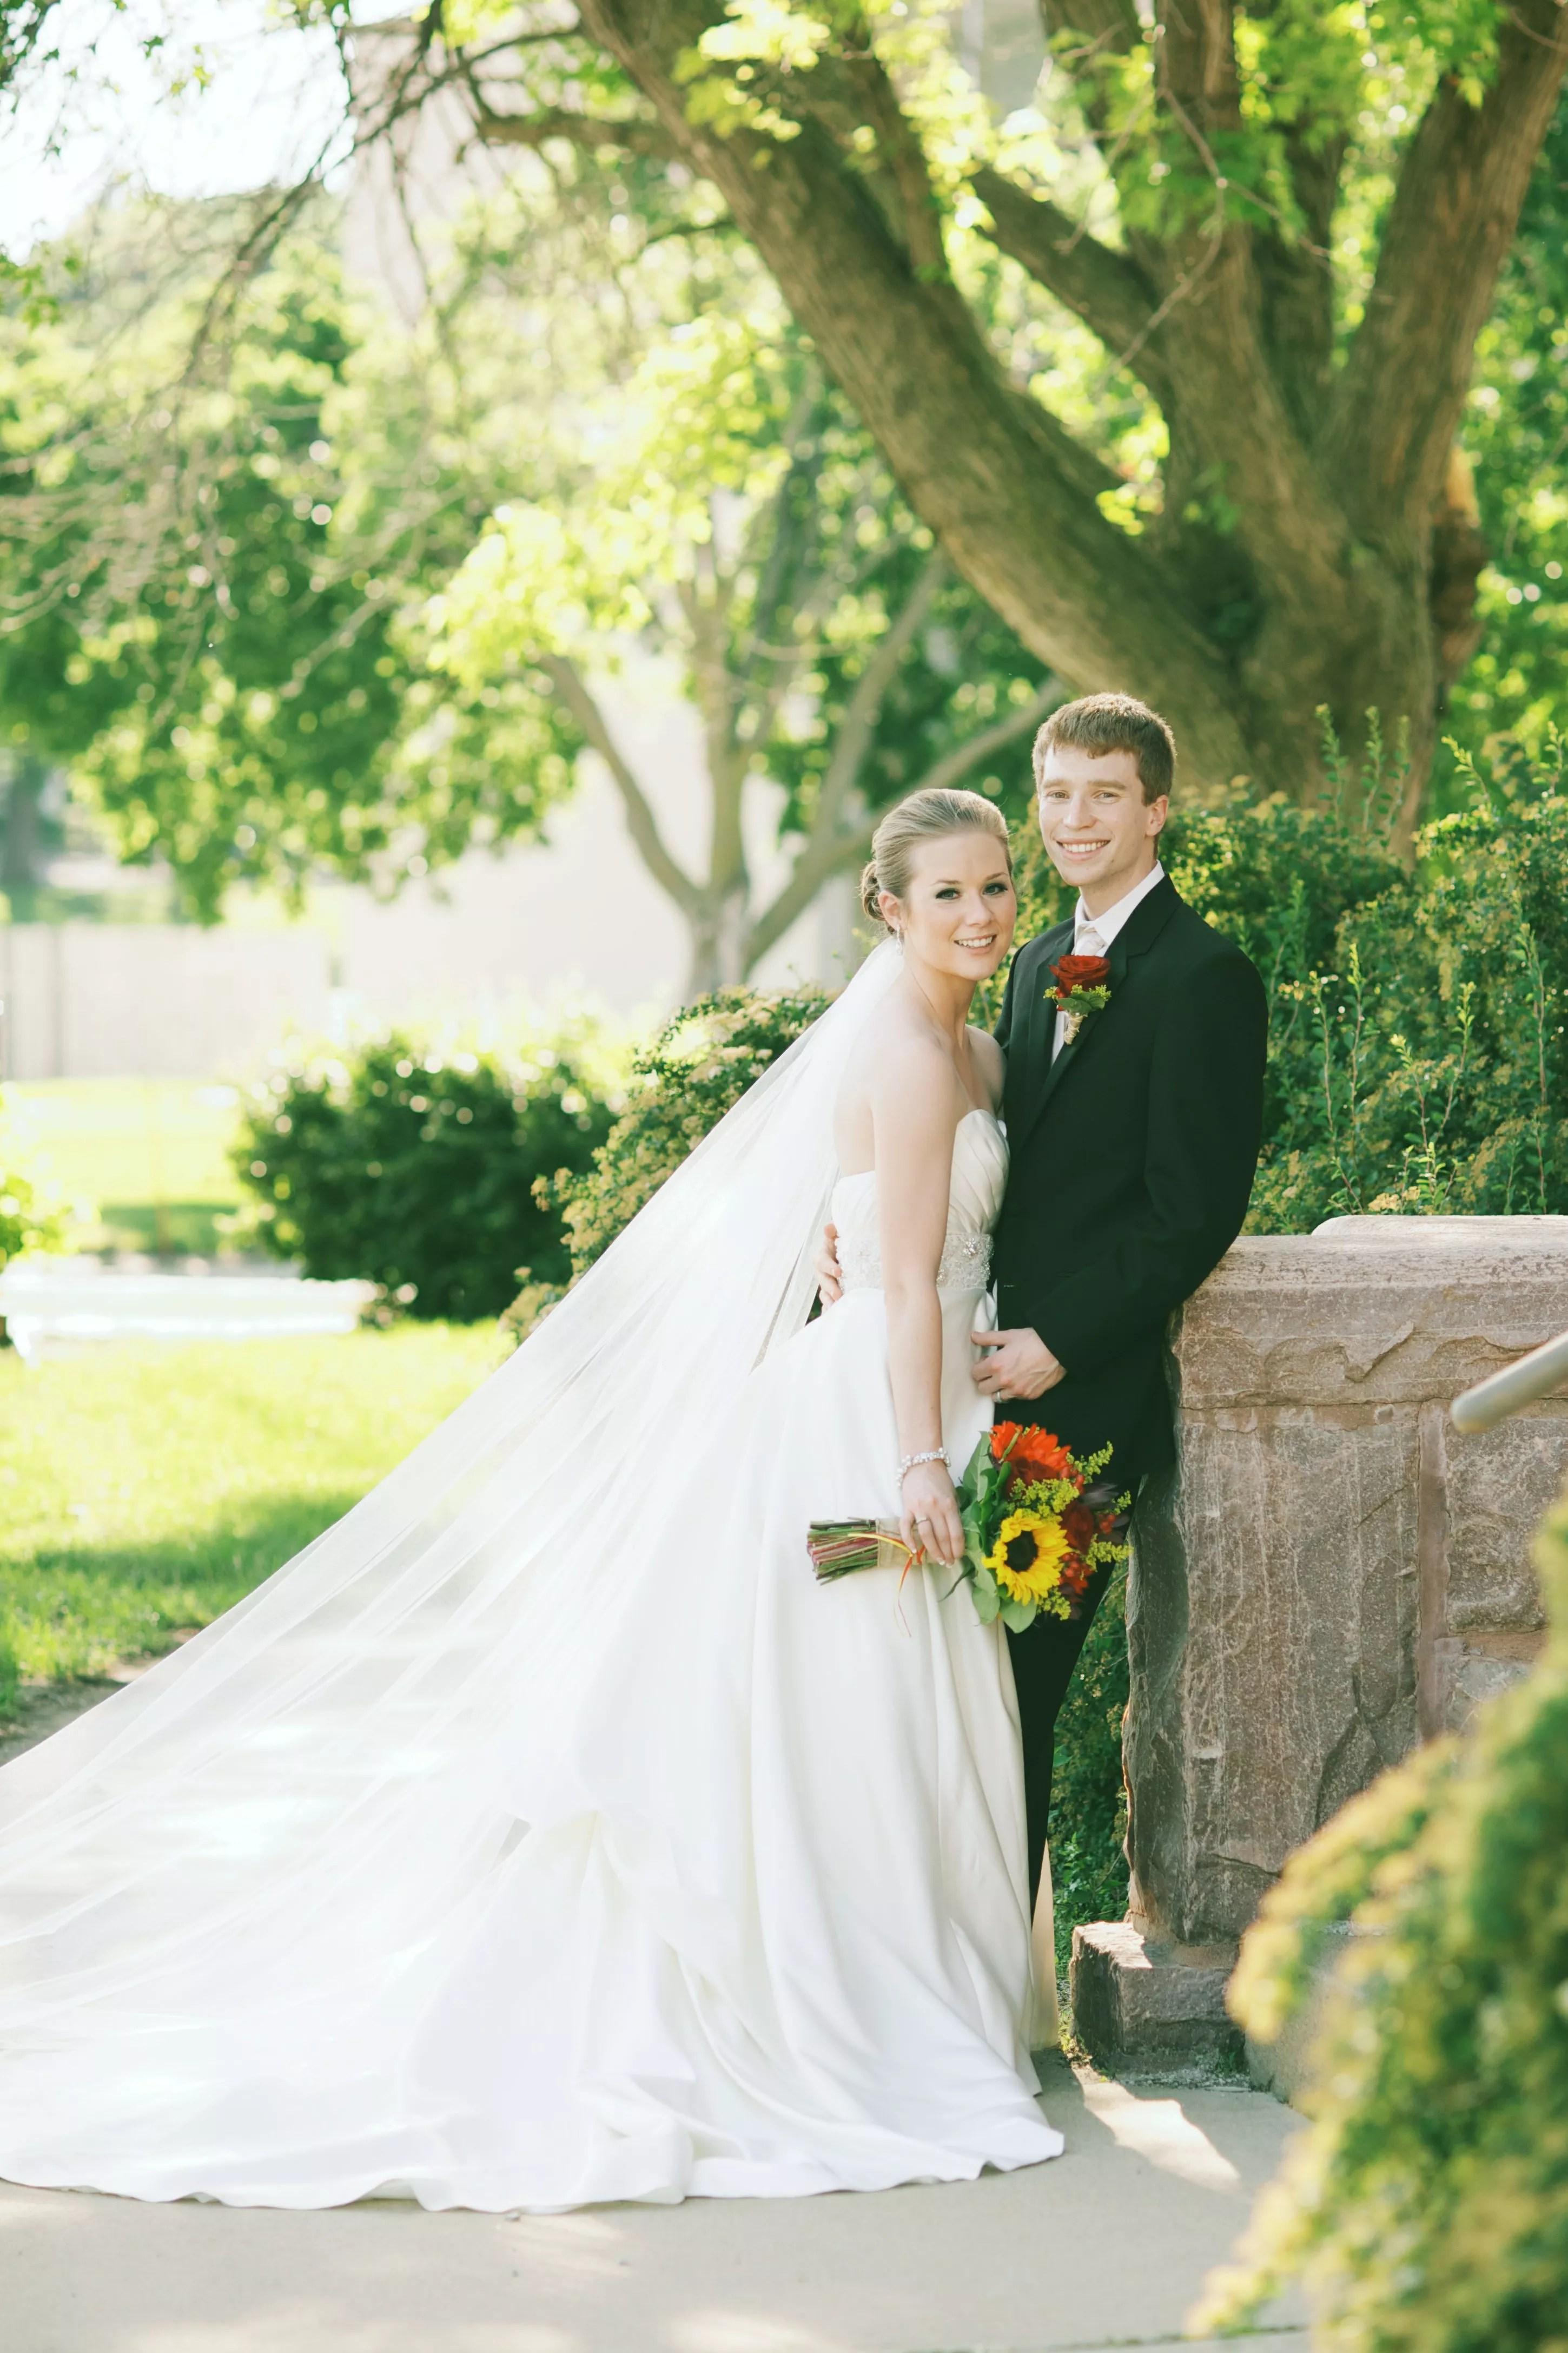 A Rustic Summer Wedding In Sioux Falls SD